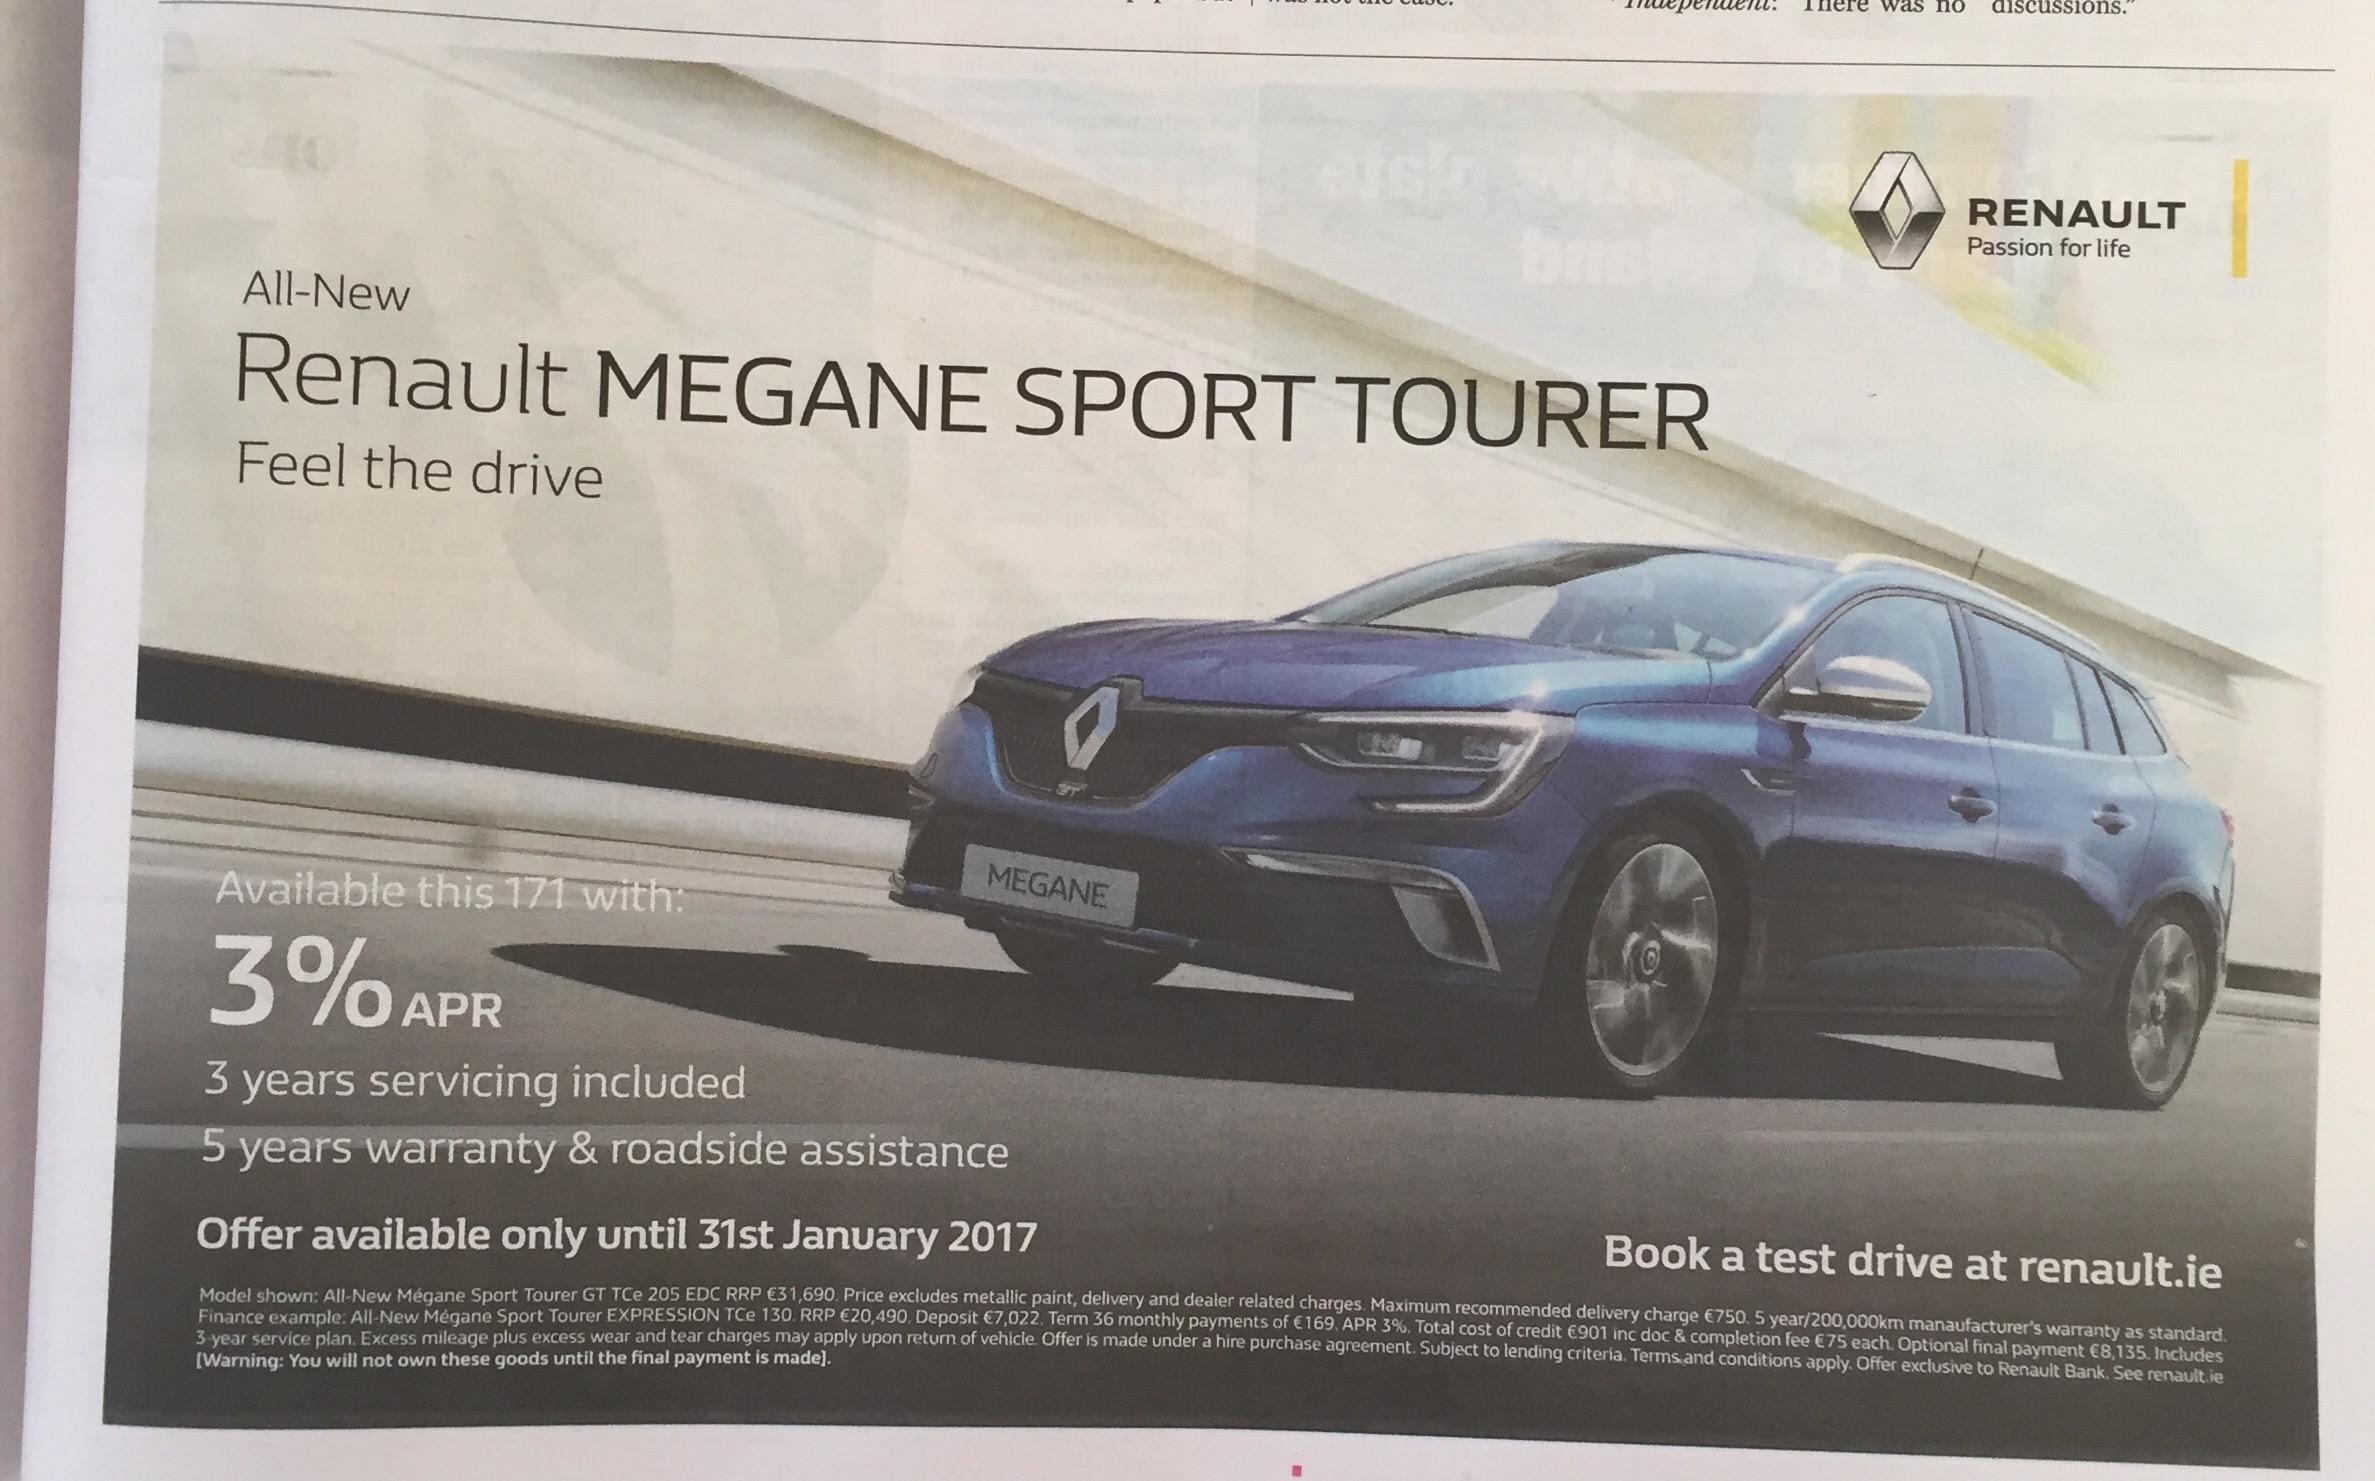 Renault Megane sport tourer – feel the drive